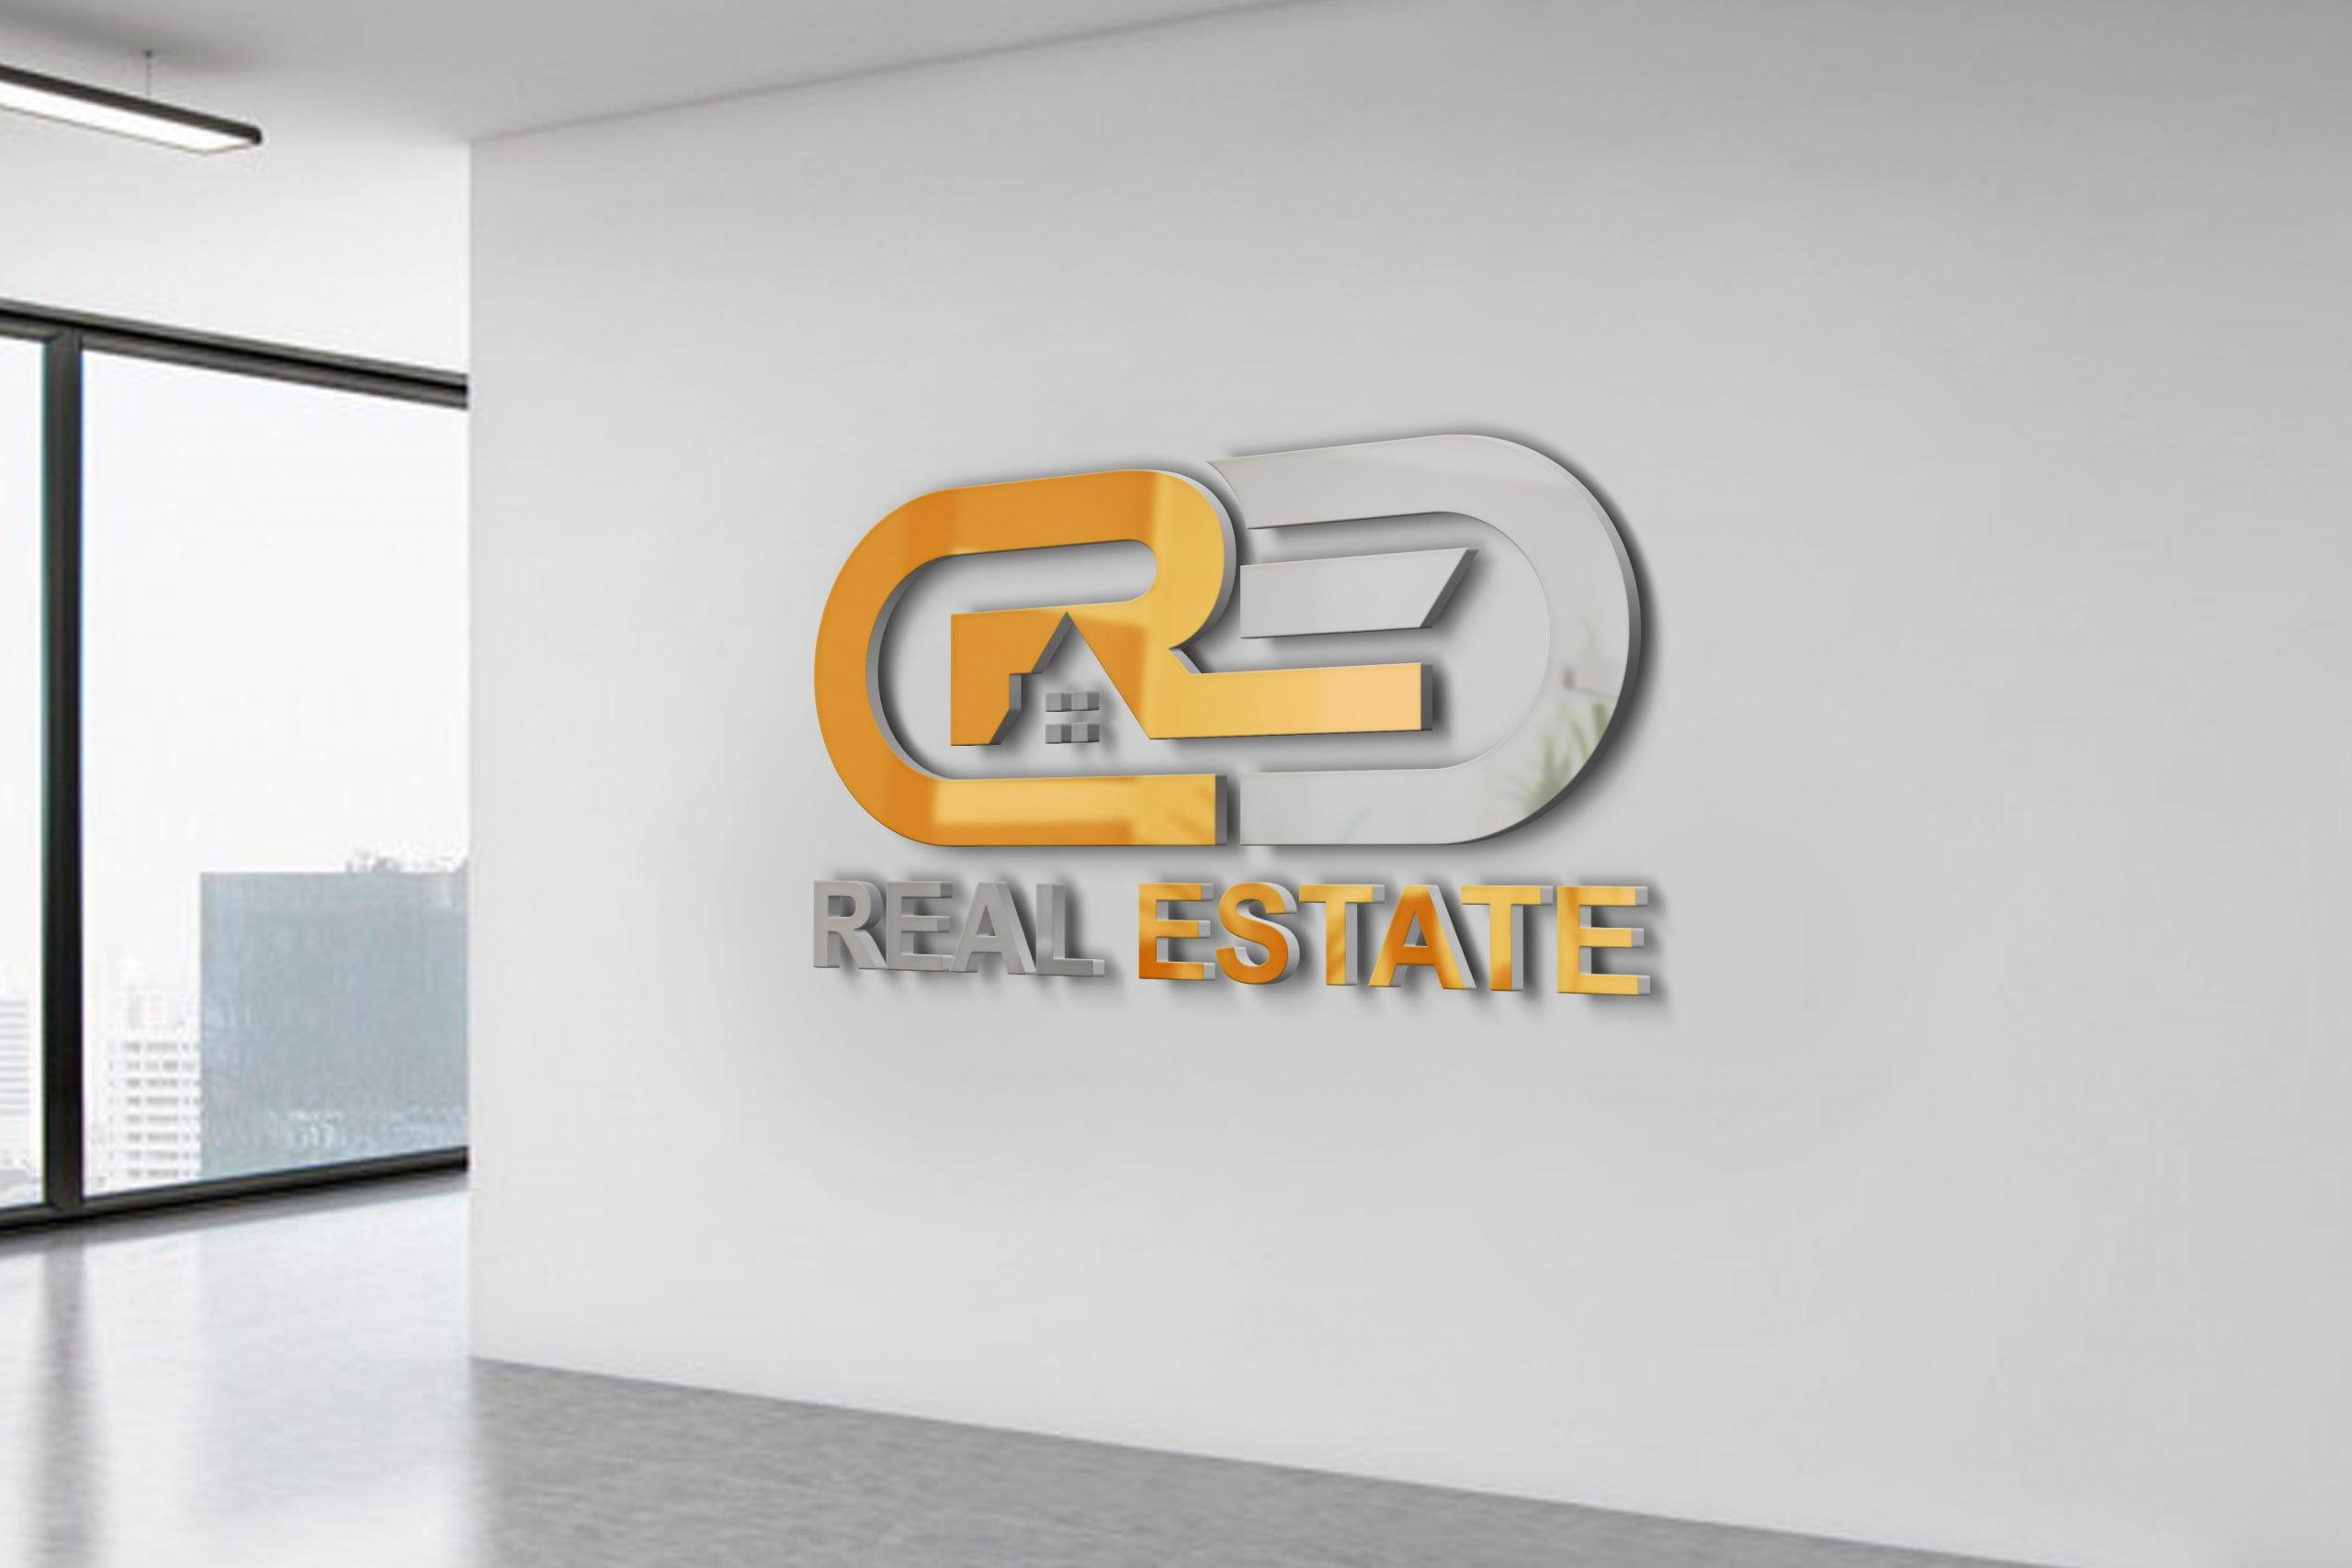 Modern Real Estate Company Logo Template PSD